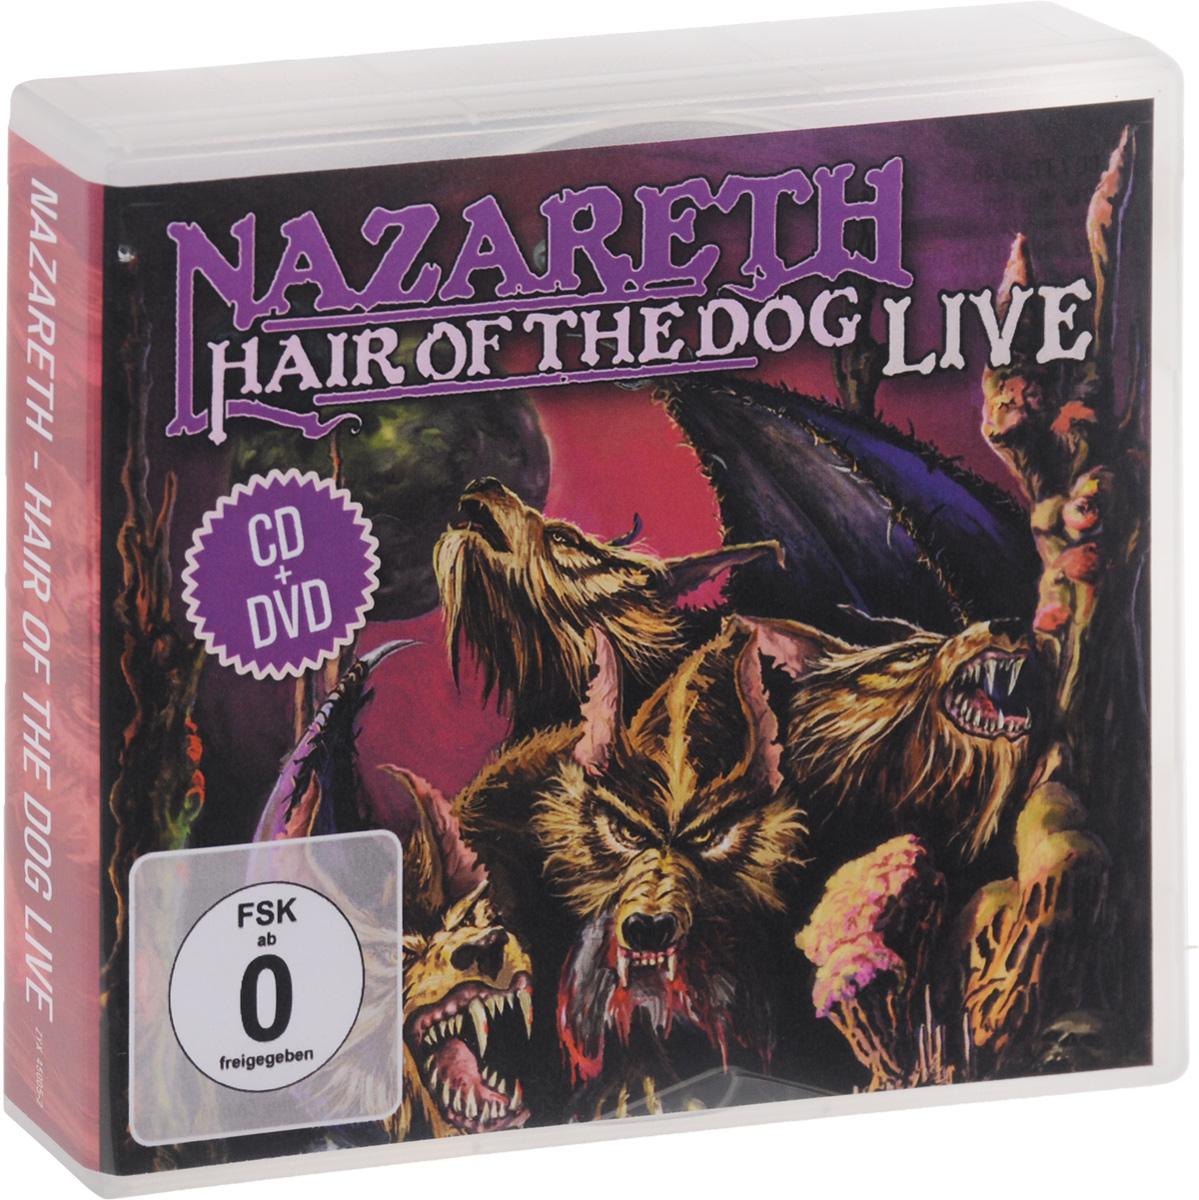 Nazareth Nazareth. Hair Of The Dog. Live (CD + DVD) виниловая пластинка nazareth hair of the dog